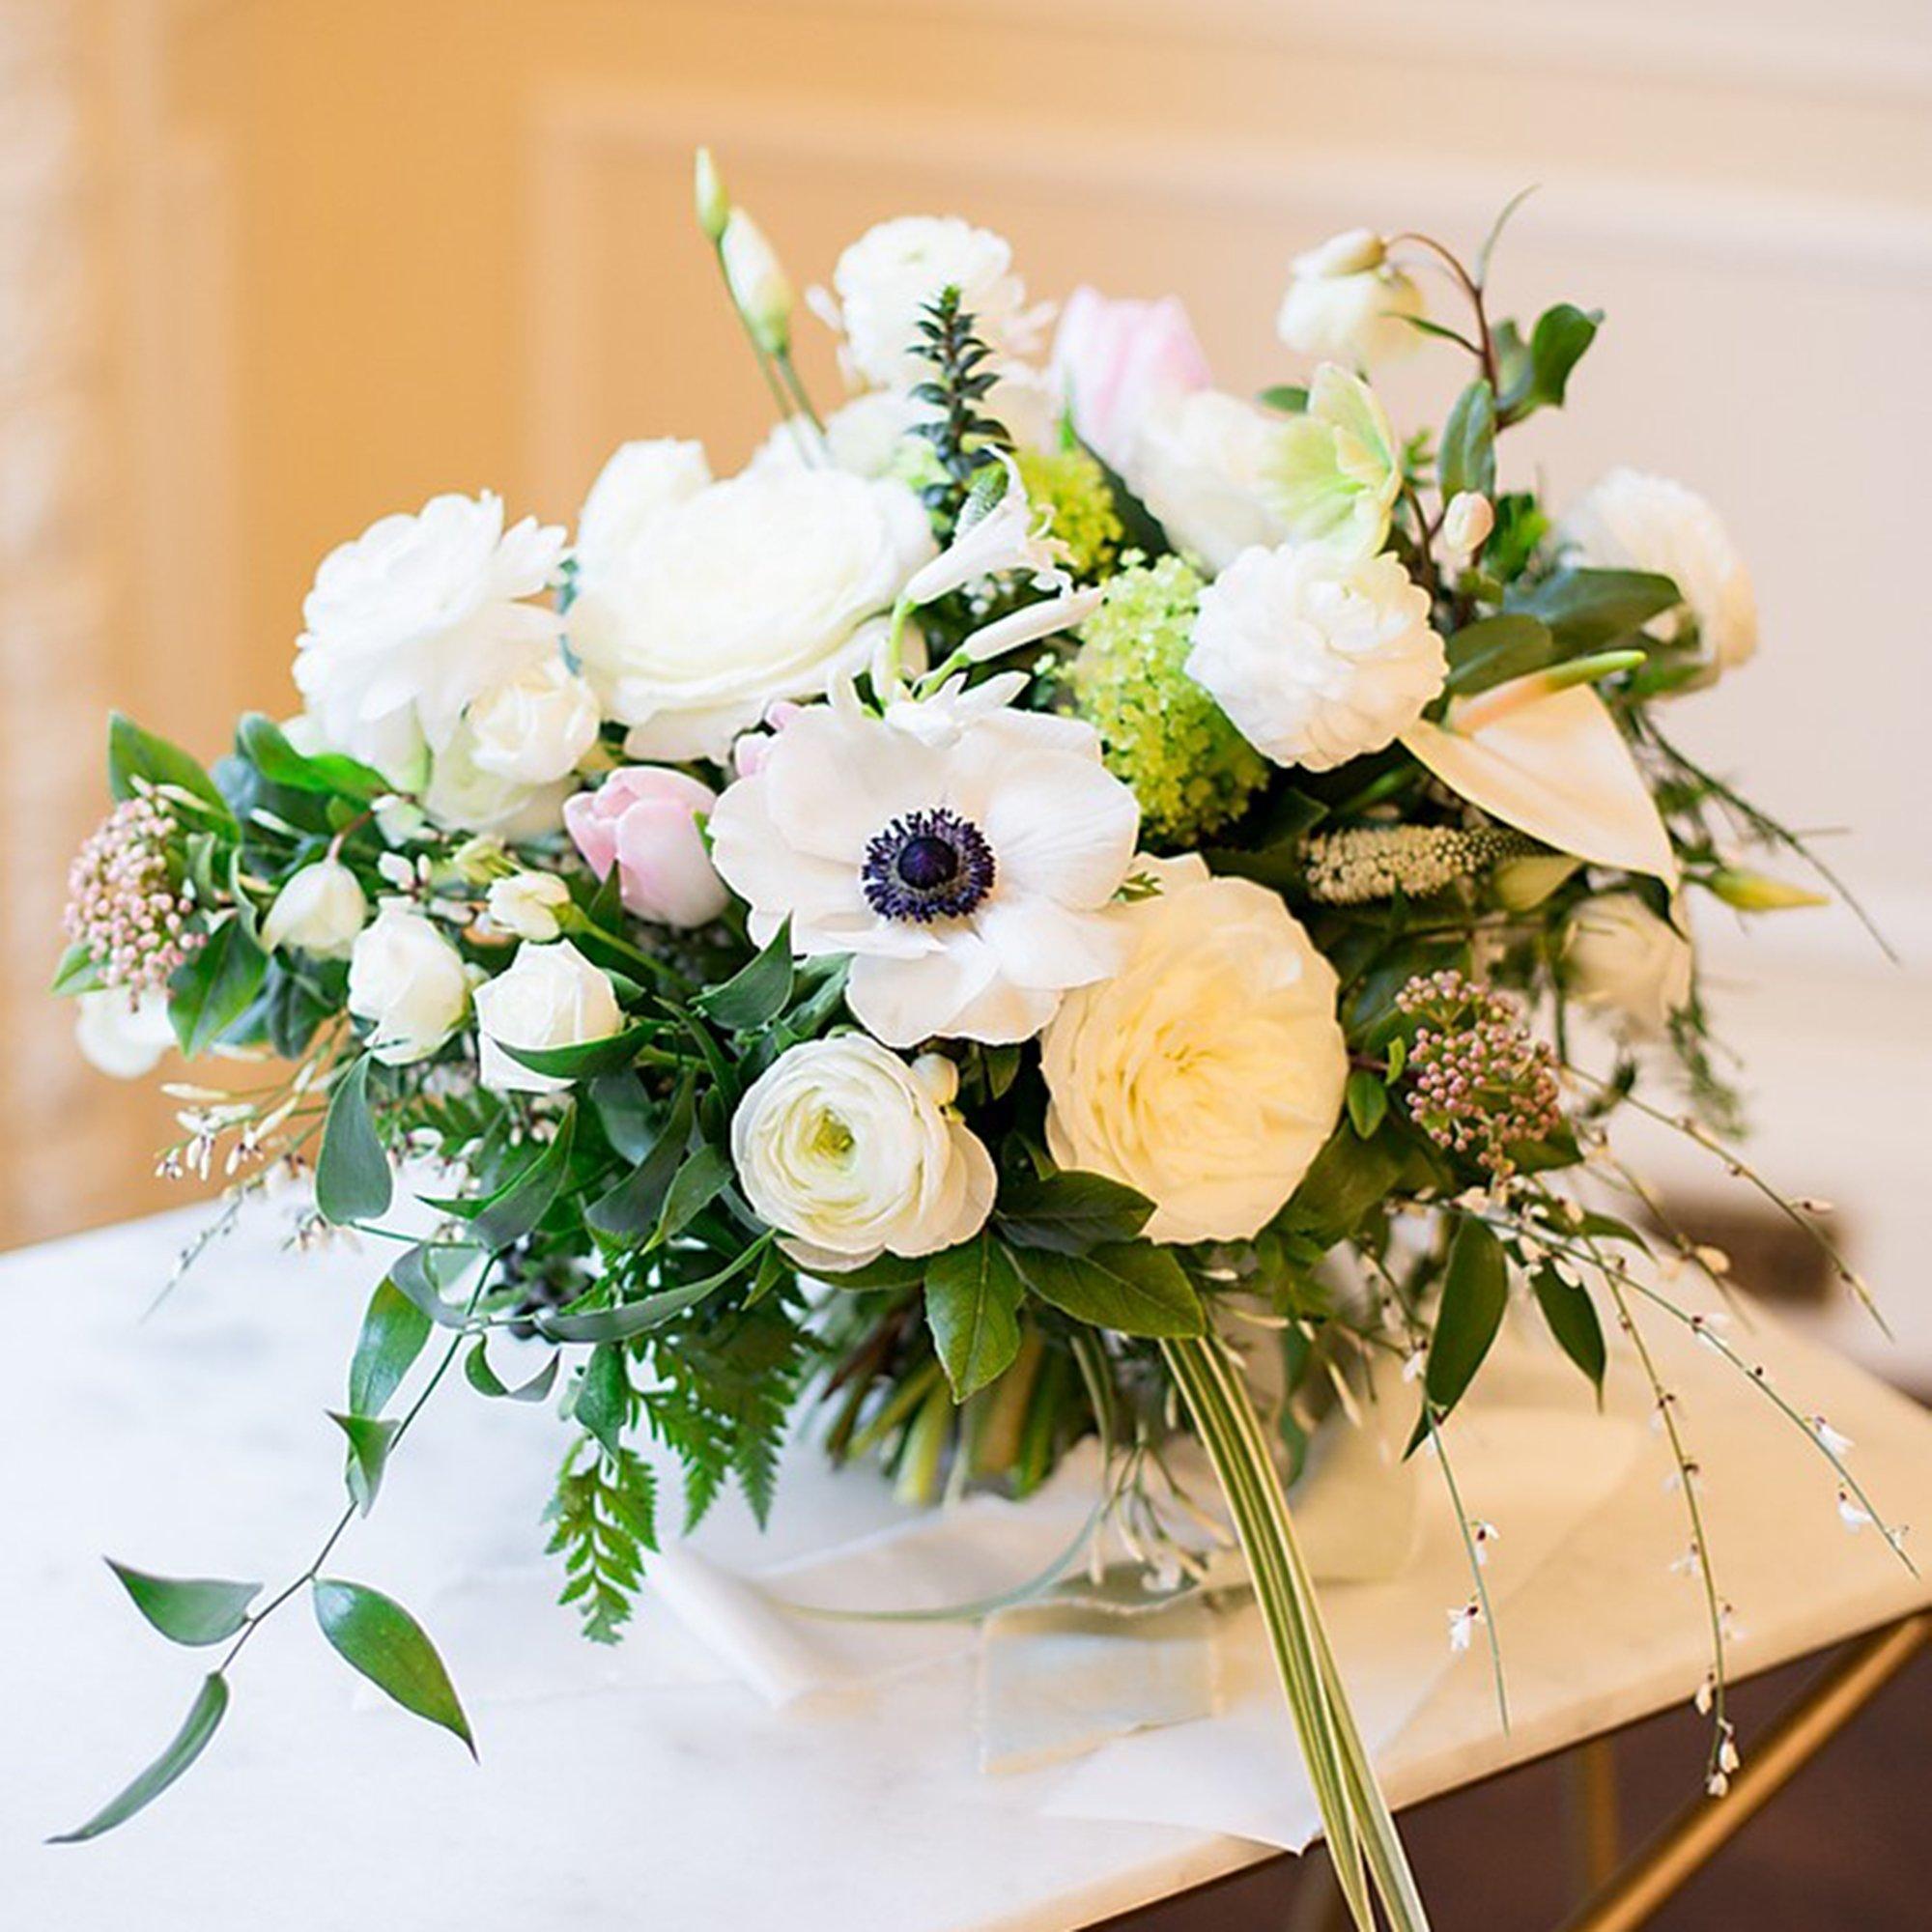 Johanna Pedrick Flowers - Booking a Wedding Florist, Flamboyant Invites